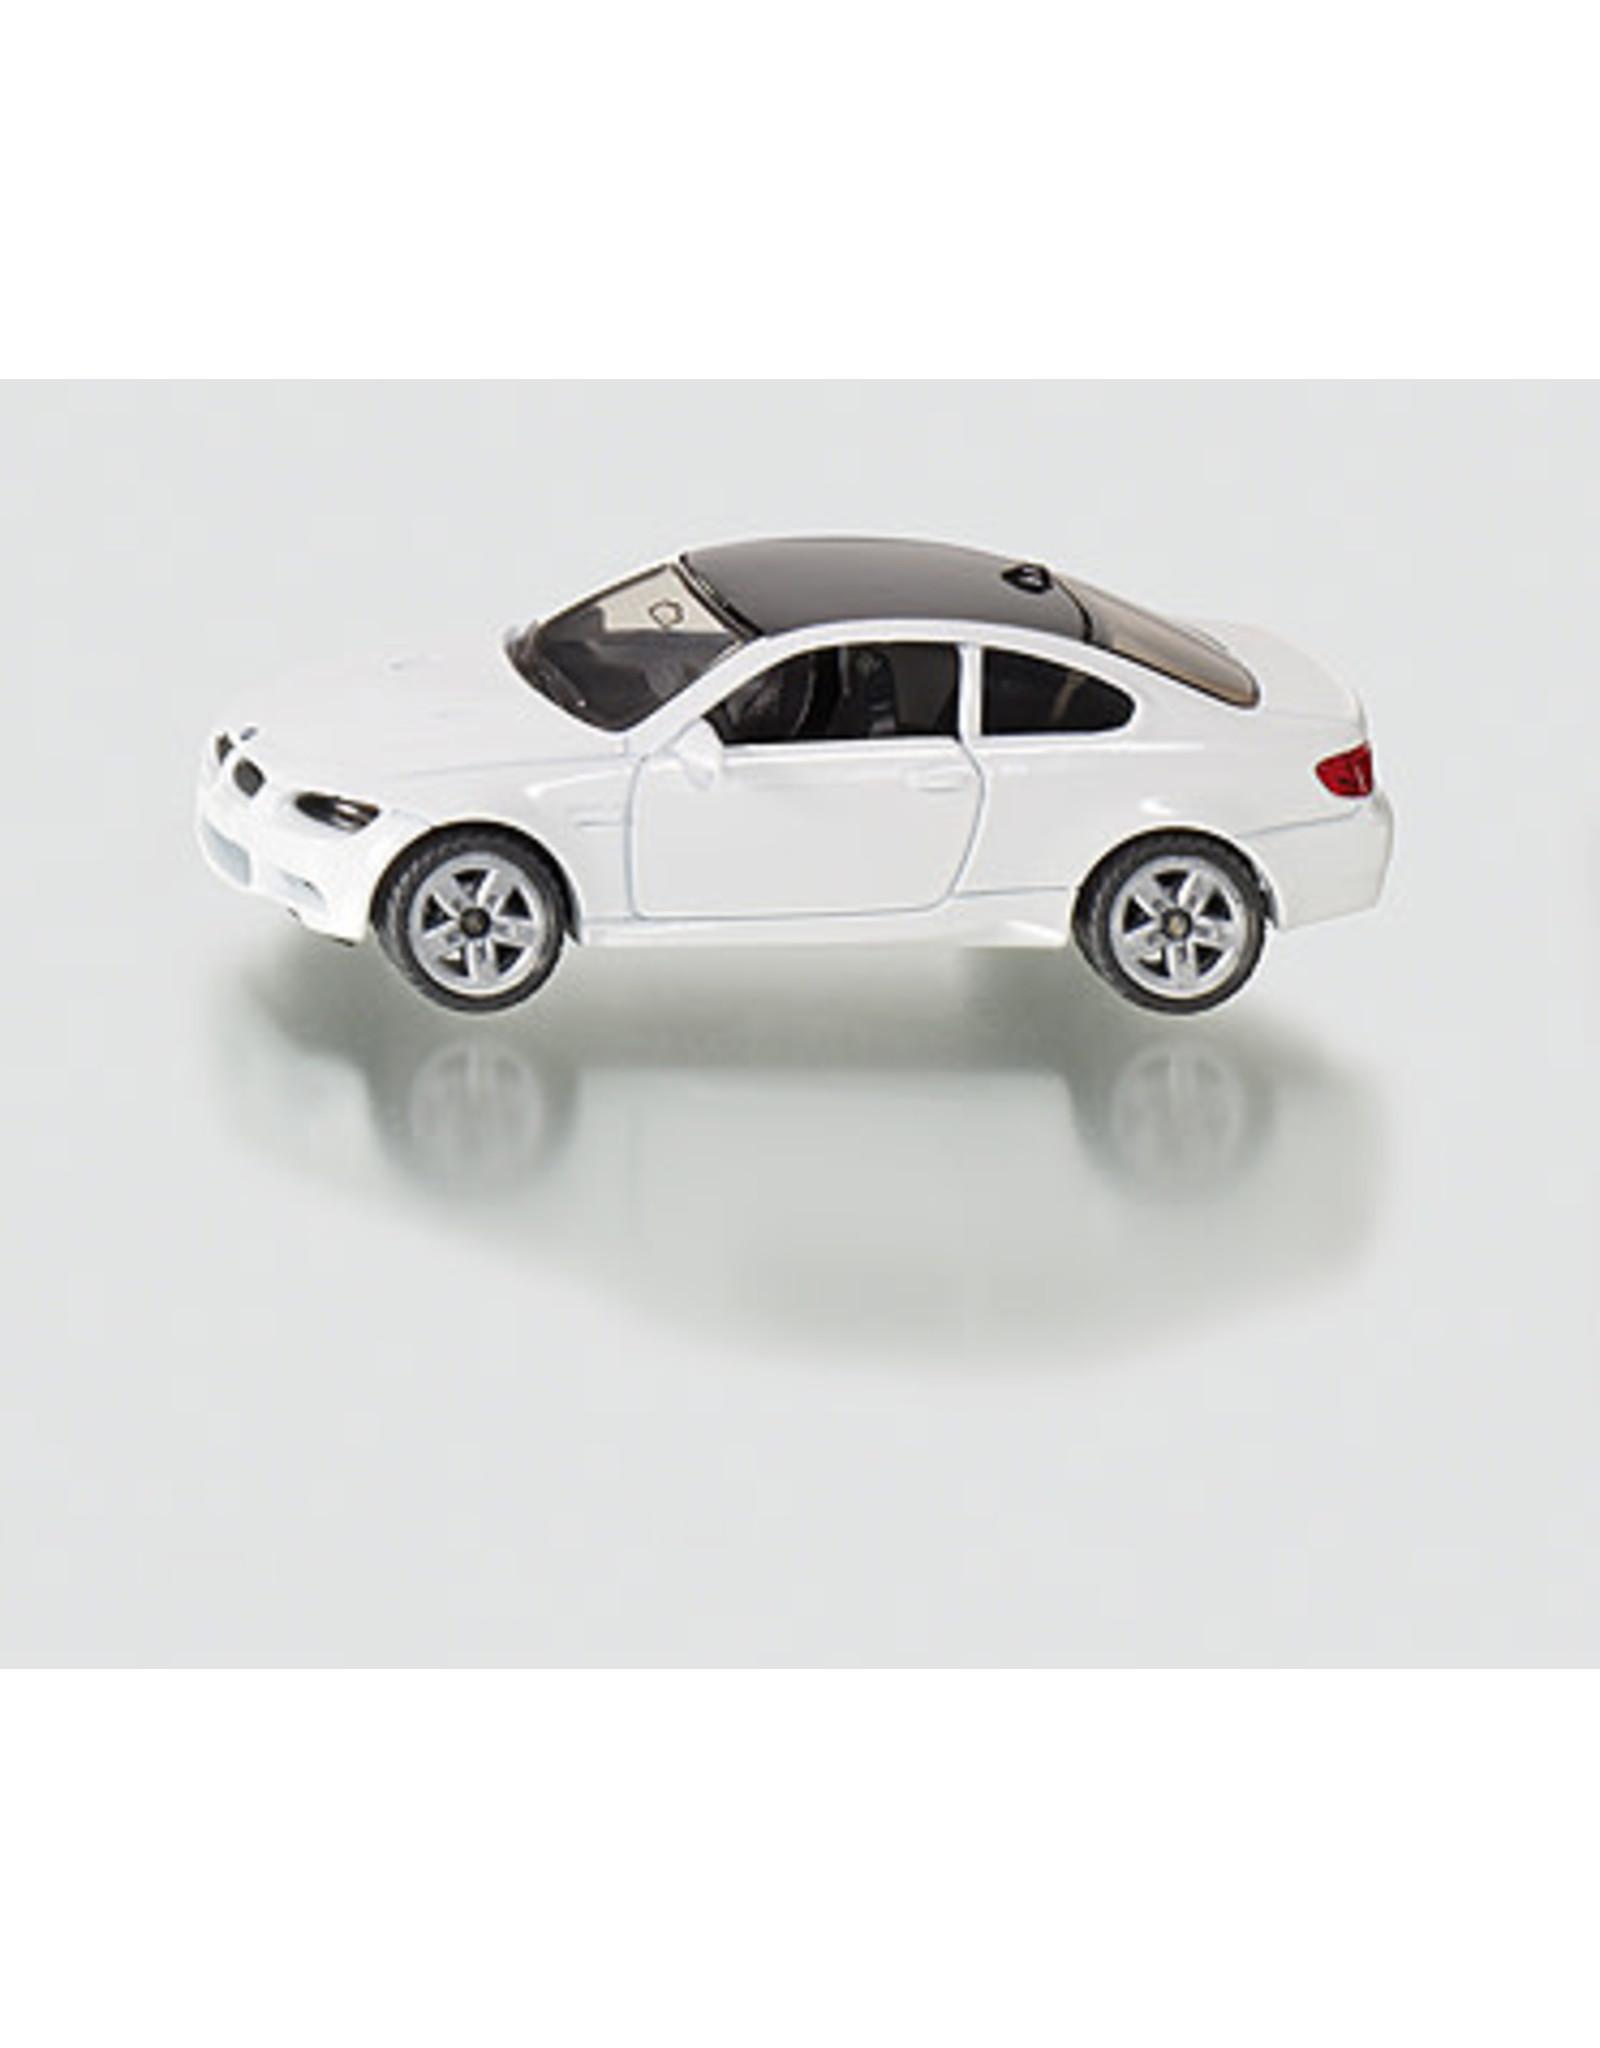 Siku Siku 1450 - BMW M3 Coupé